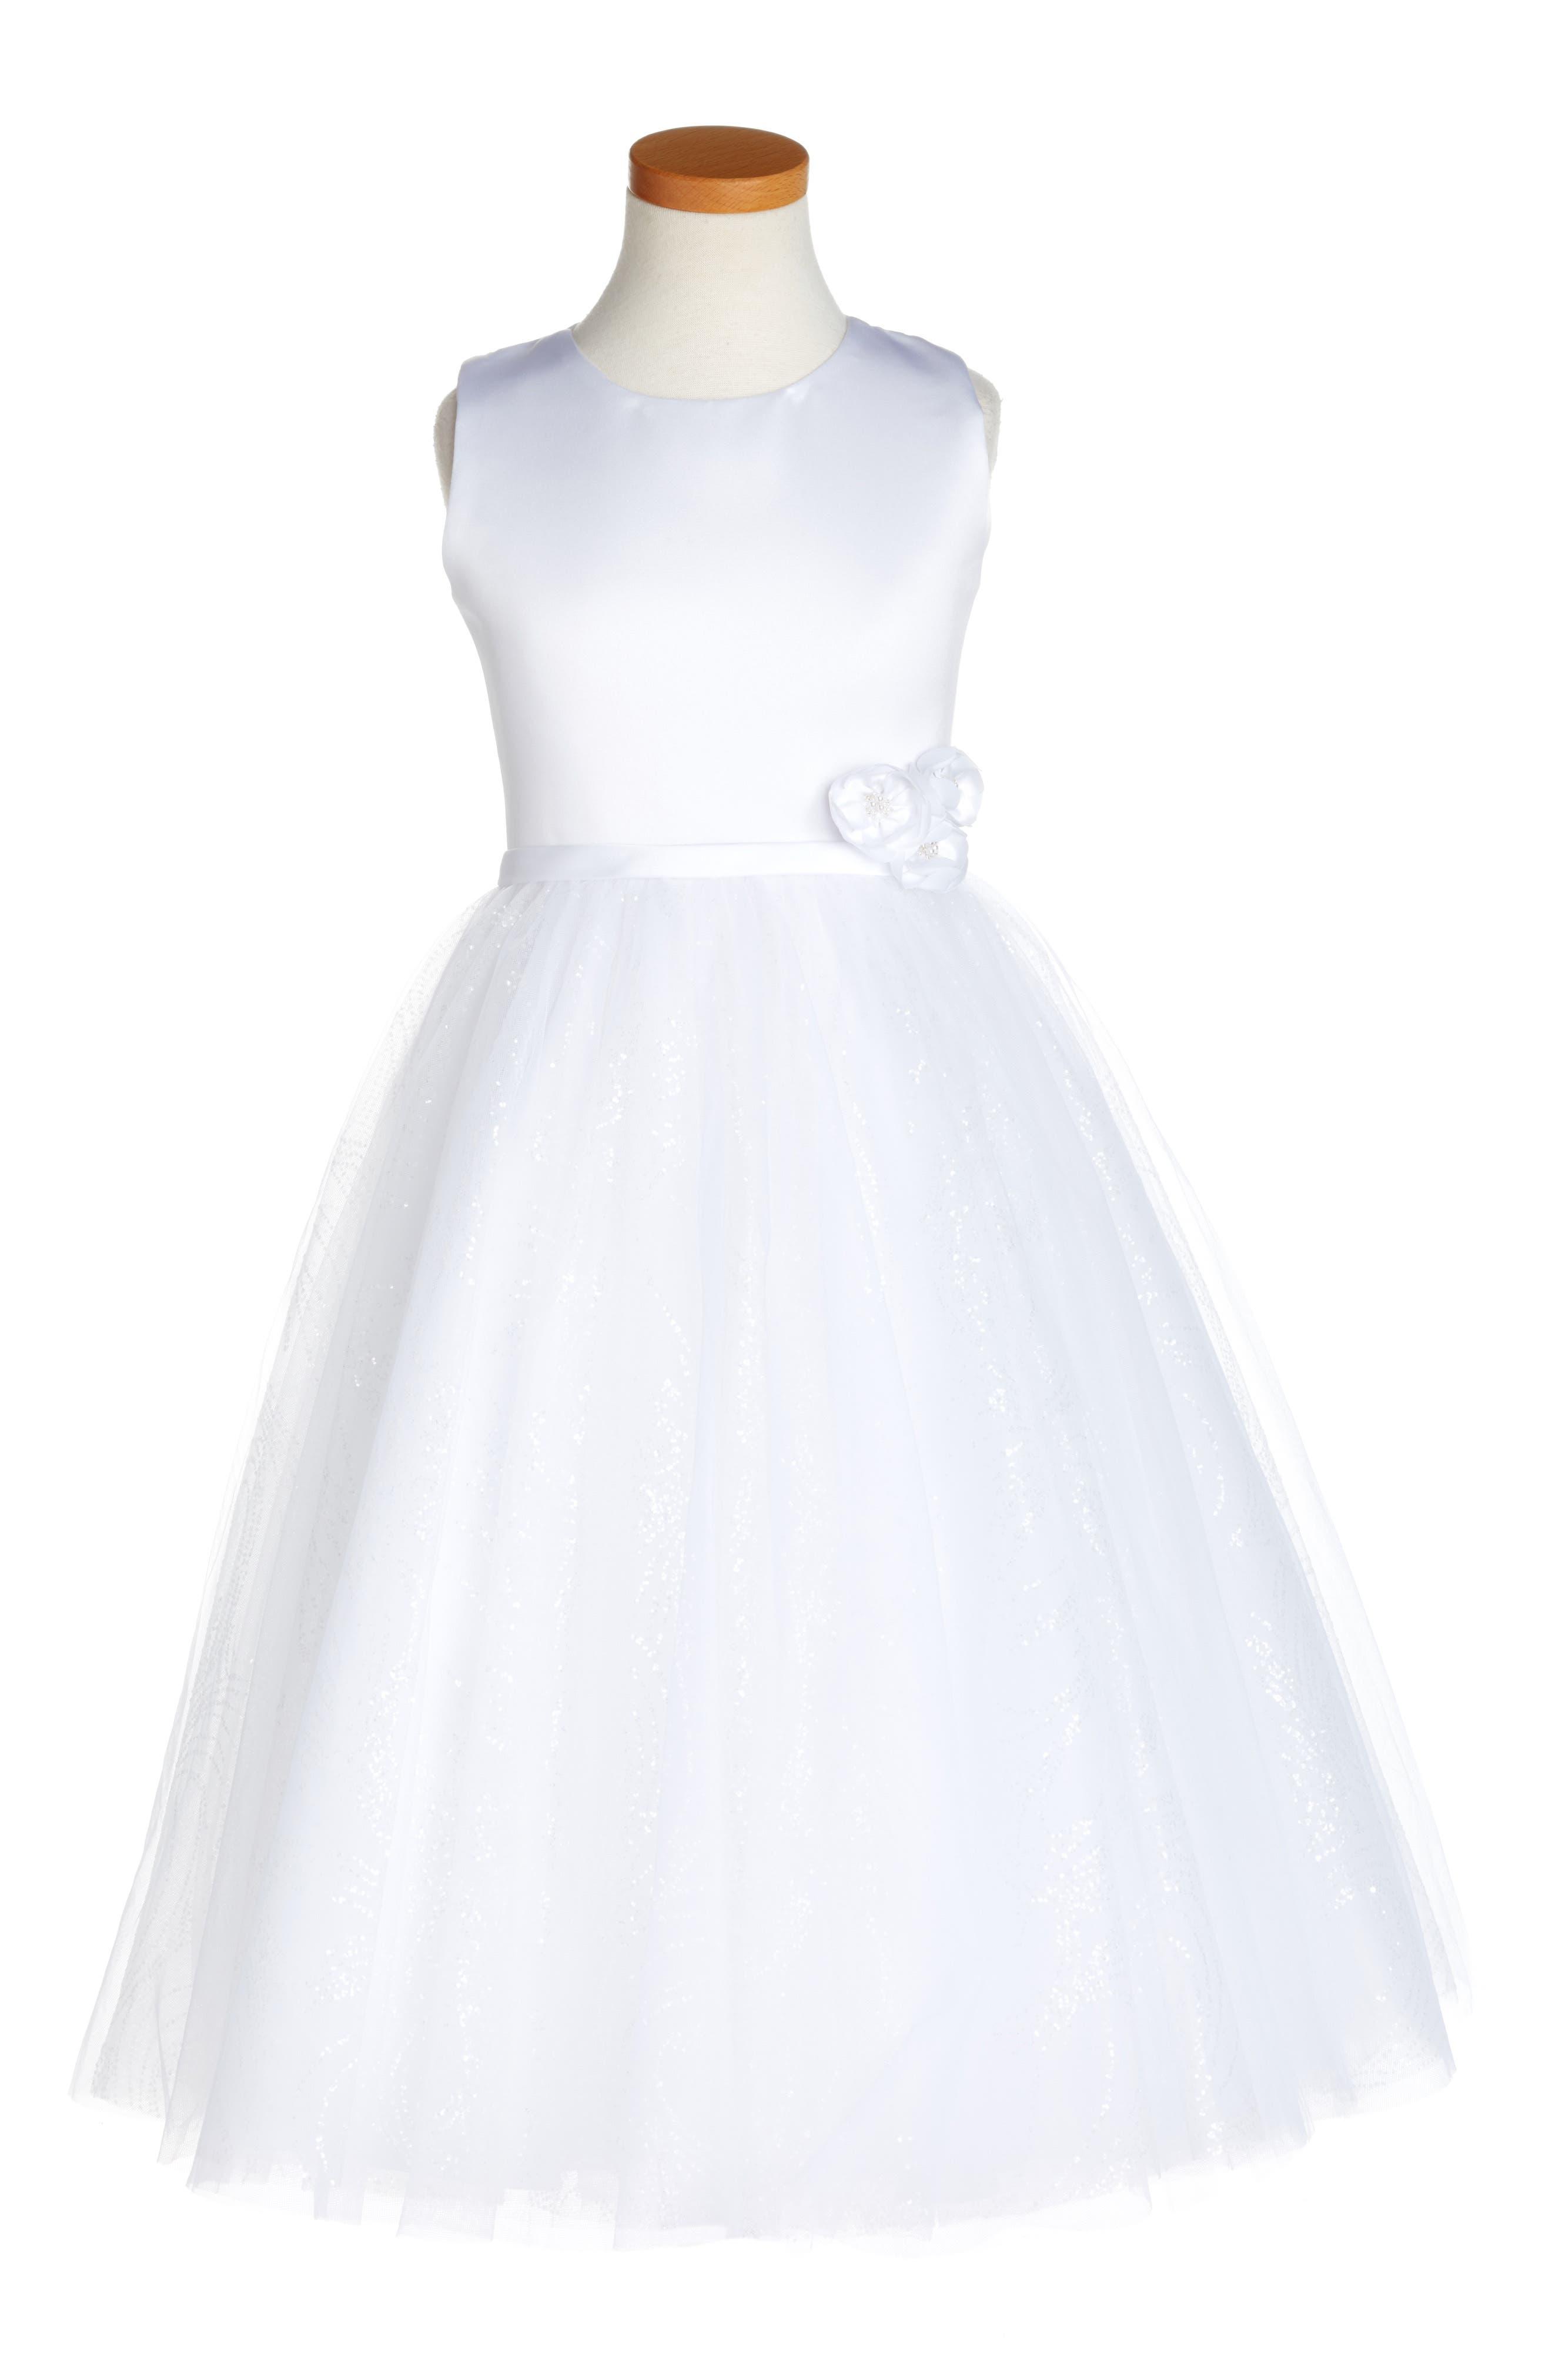 Joan Calabrese for Mon Cheri Glitter Floral First Communion Dress (Little Girls & Big Girls)